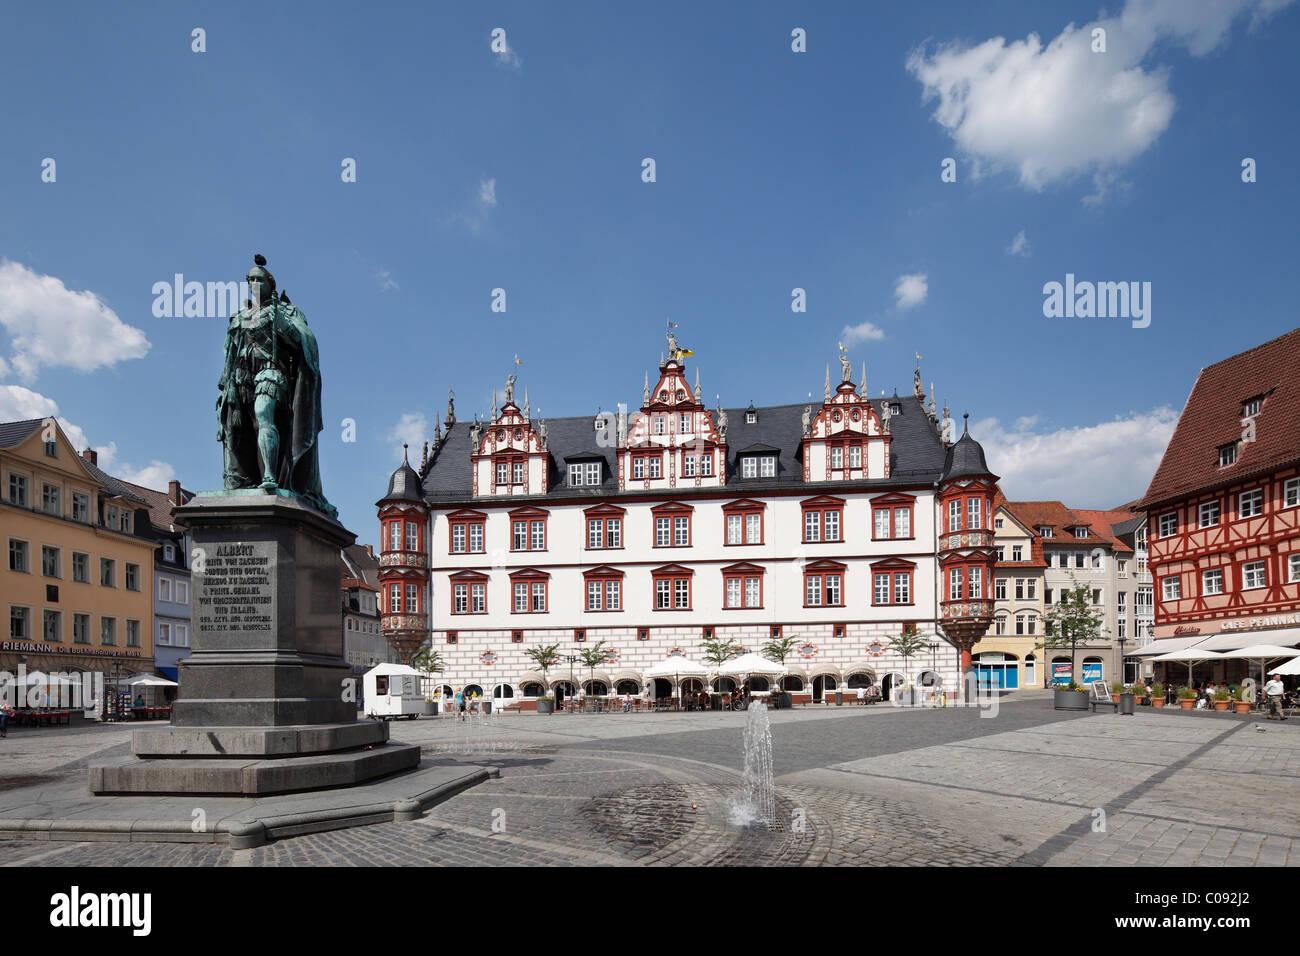 Prince Albert Memorial and City Hall on Marktplatz square, Coburg, Upper Franconia, Franconia, Bavaria, Germany, - Stock Image